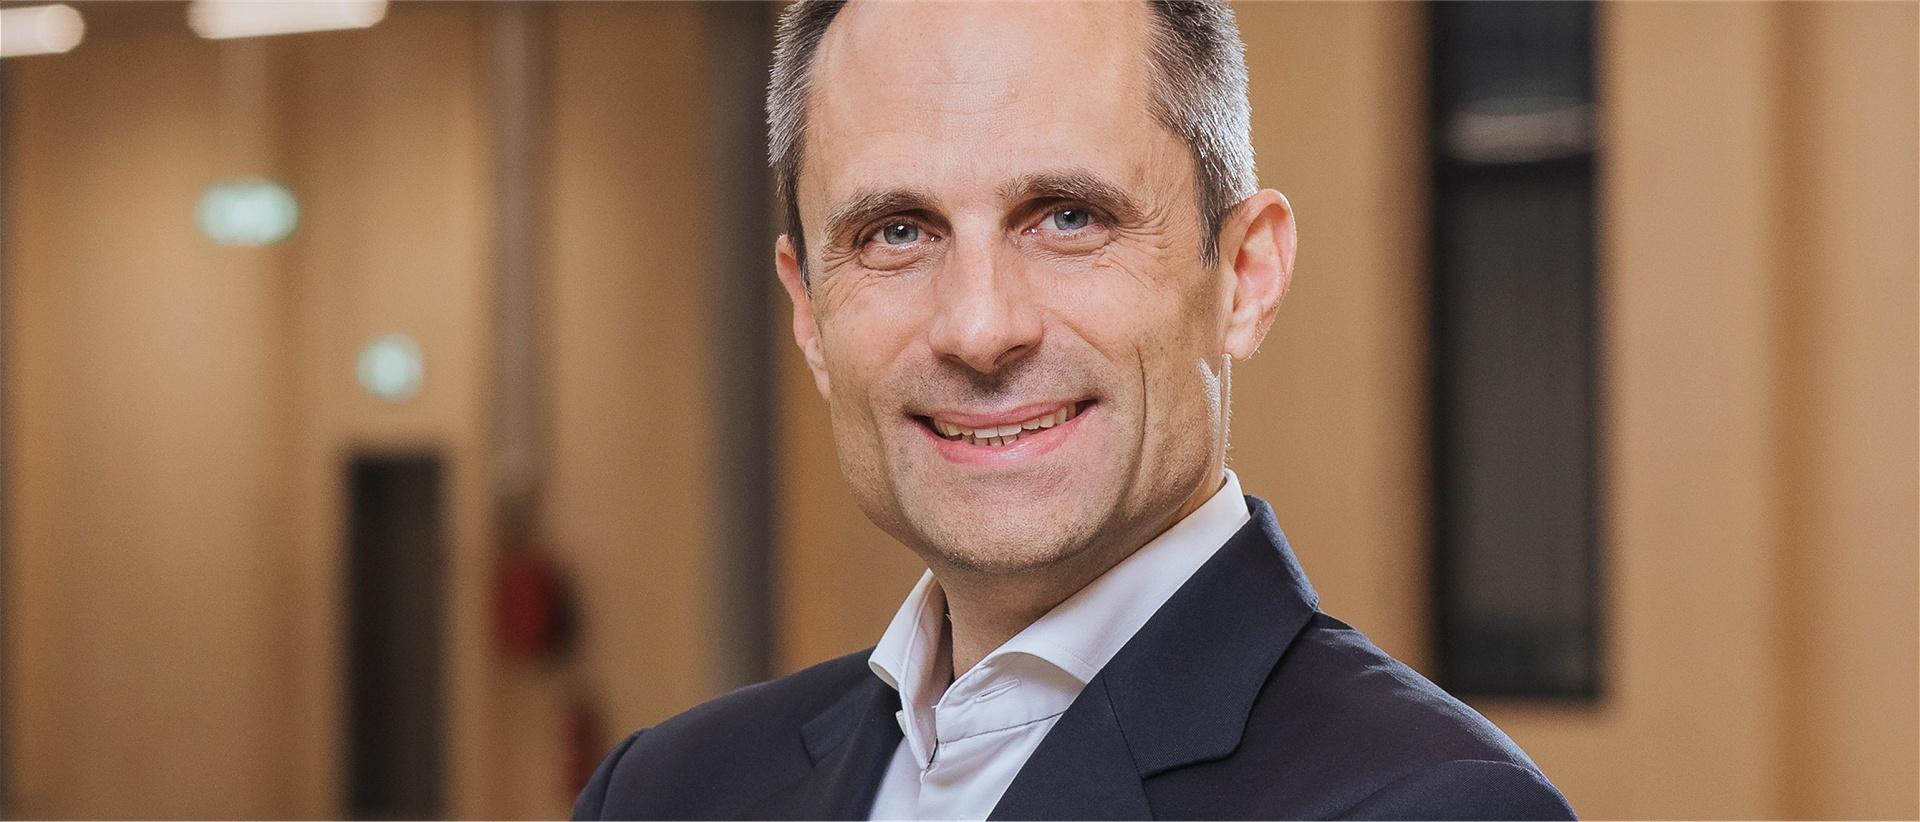 Peter Spirig